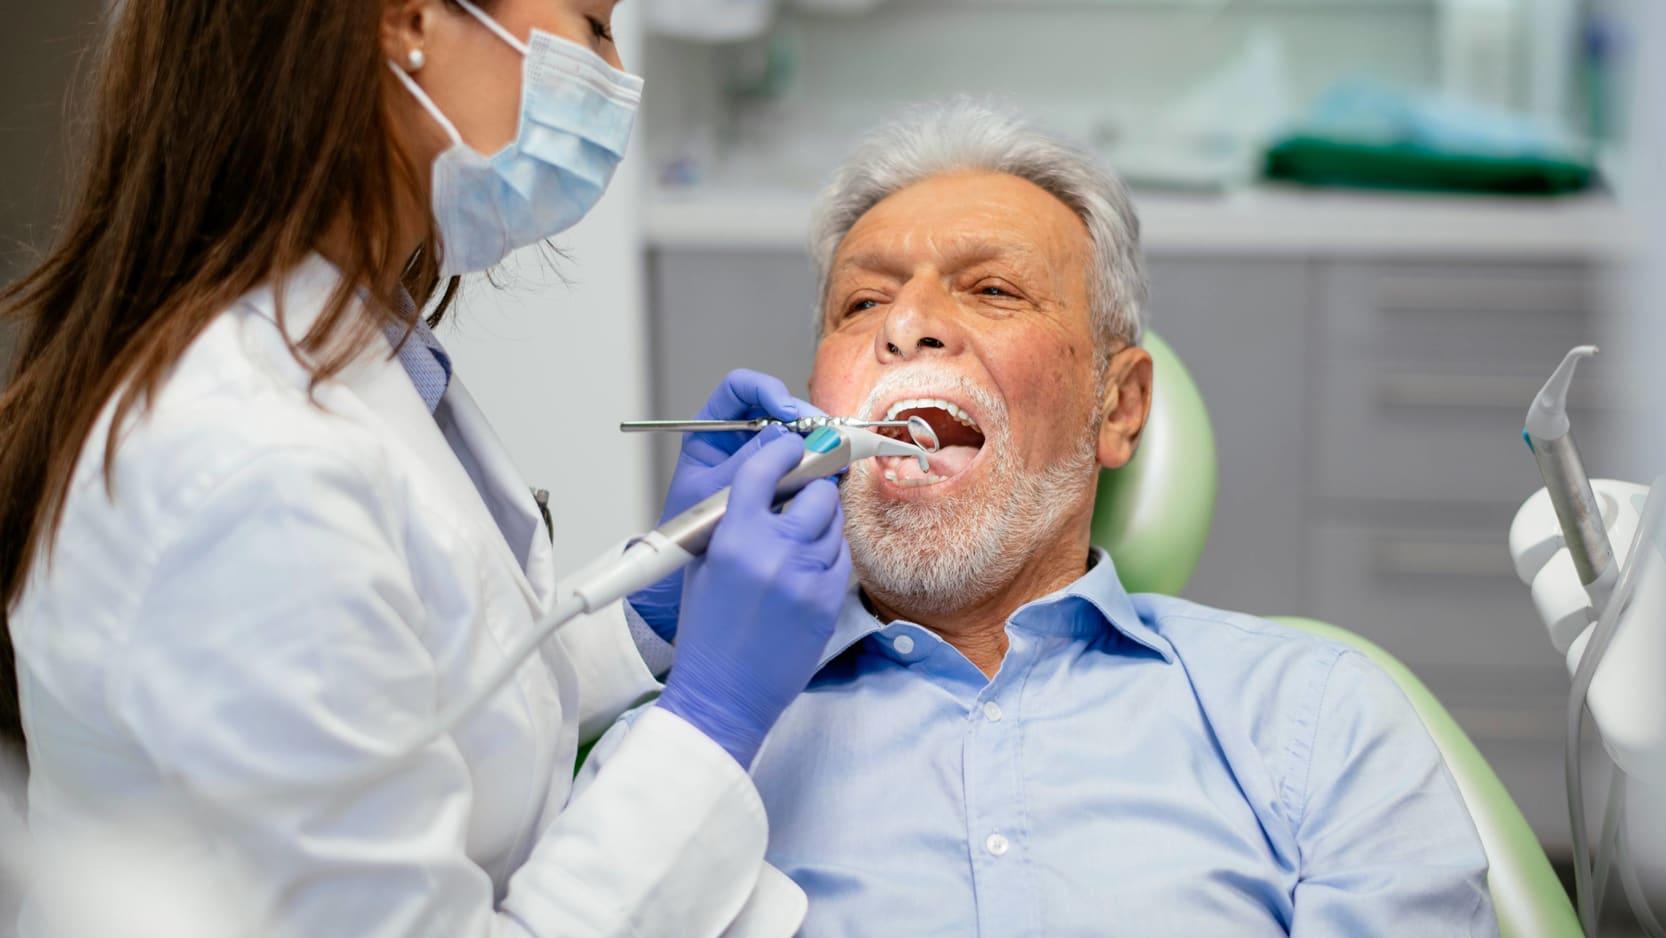 A senior man having his teeth cleaned.